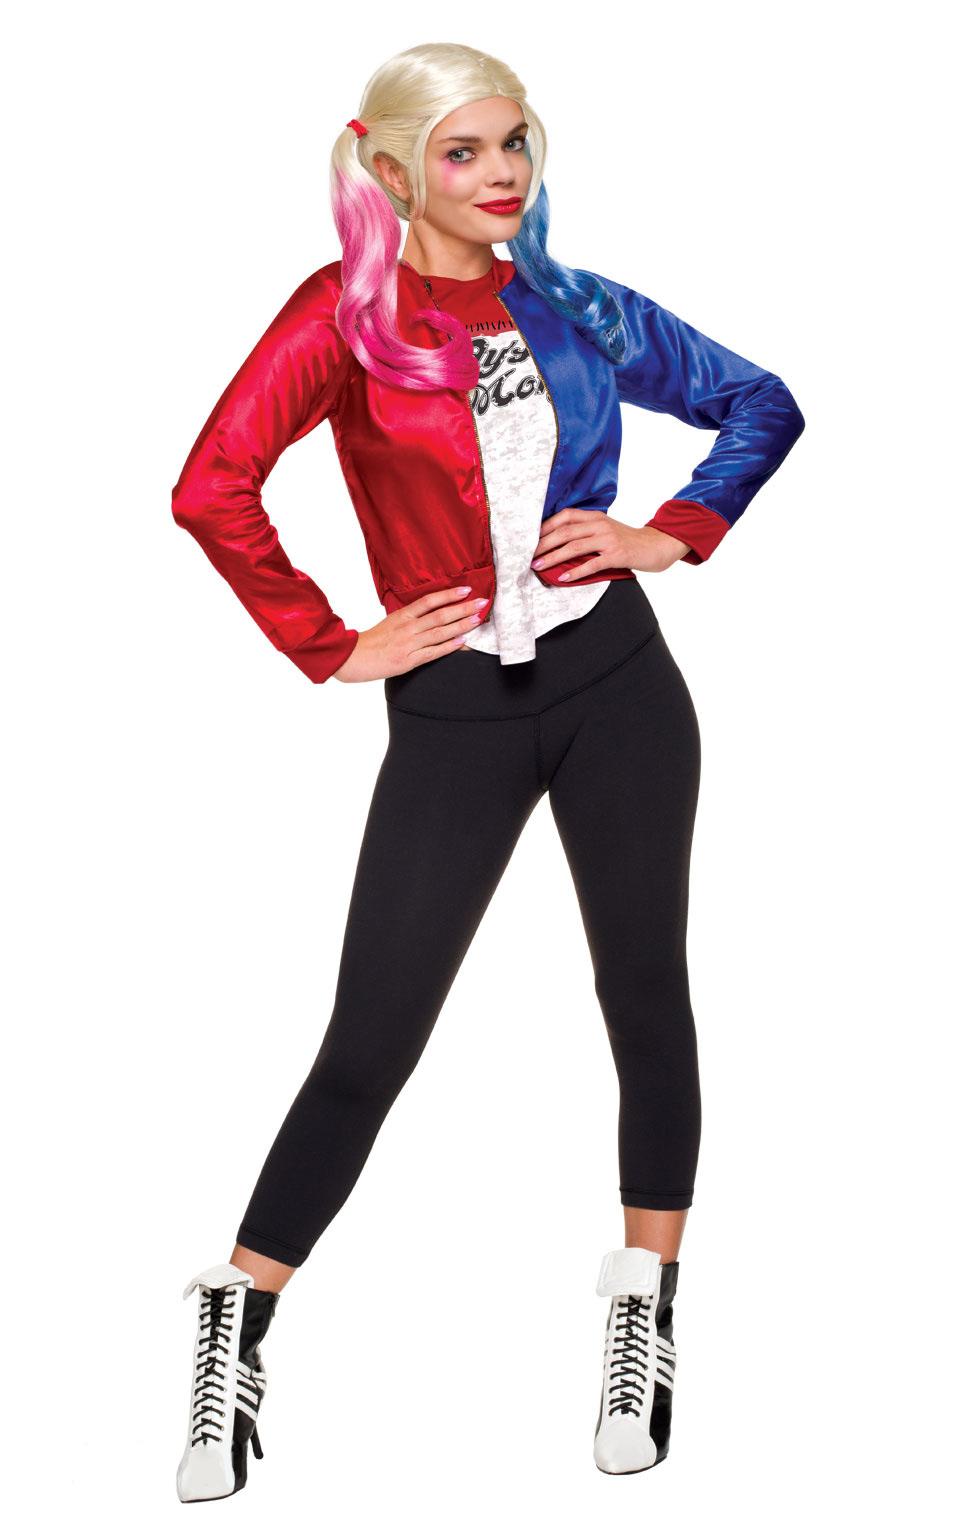 Maskeradkläder Vuxna - Harley Quinn Maskeraddräkt Vuxen